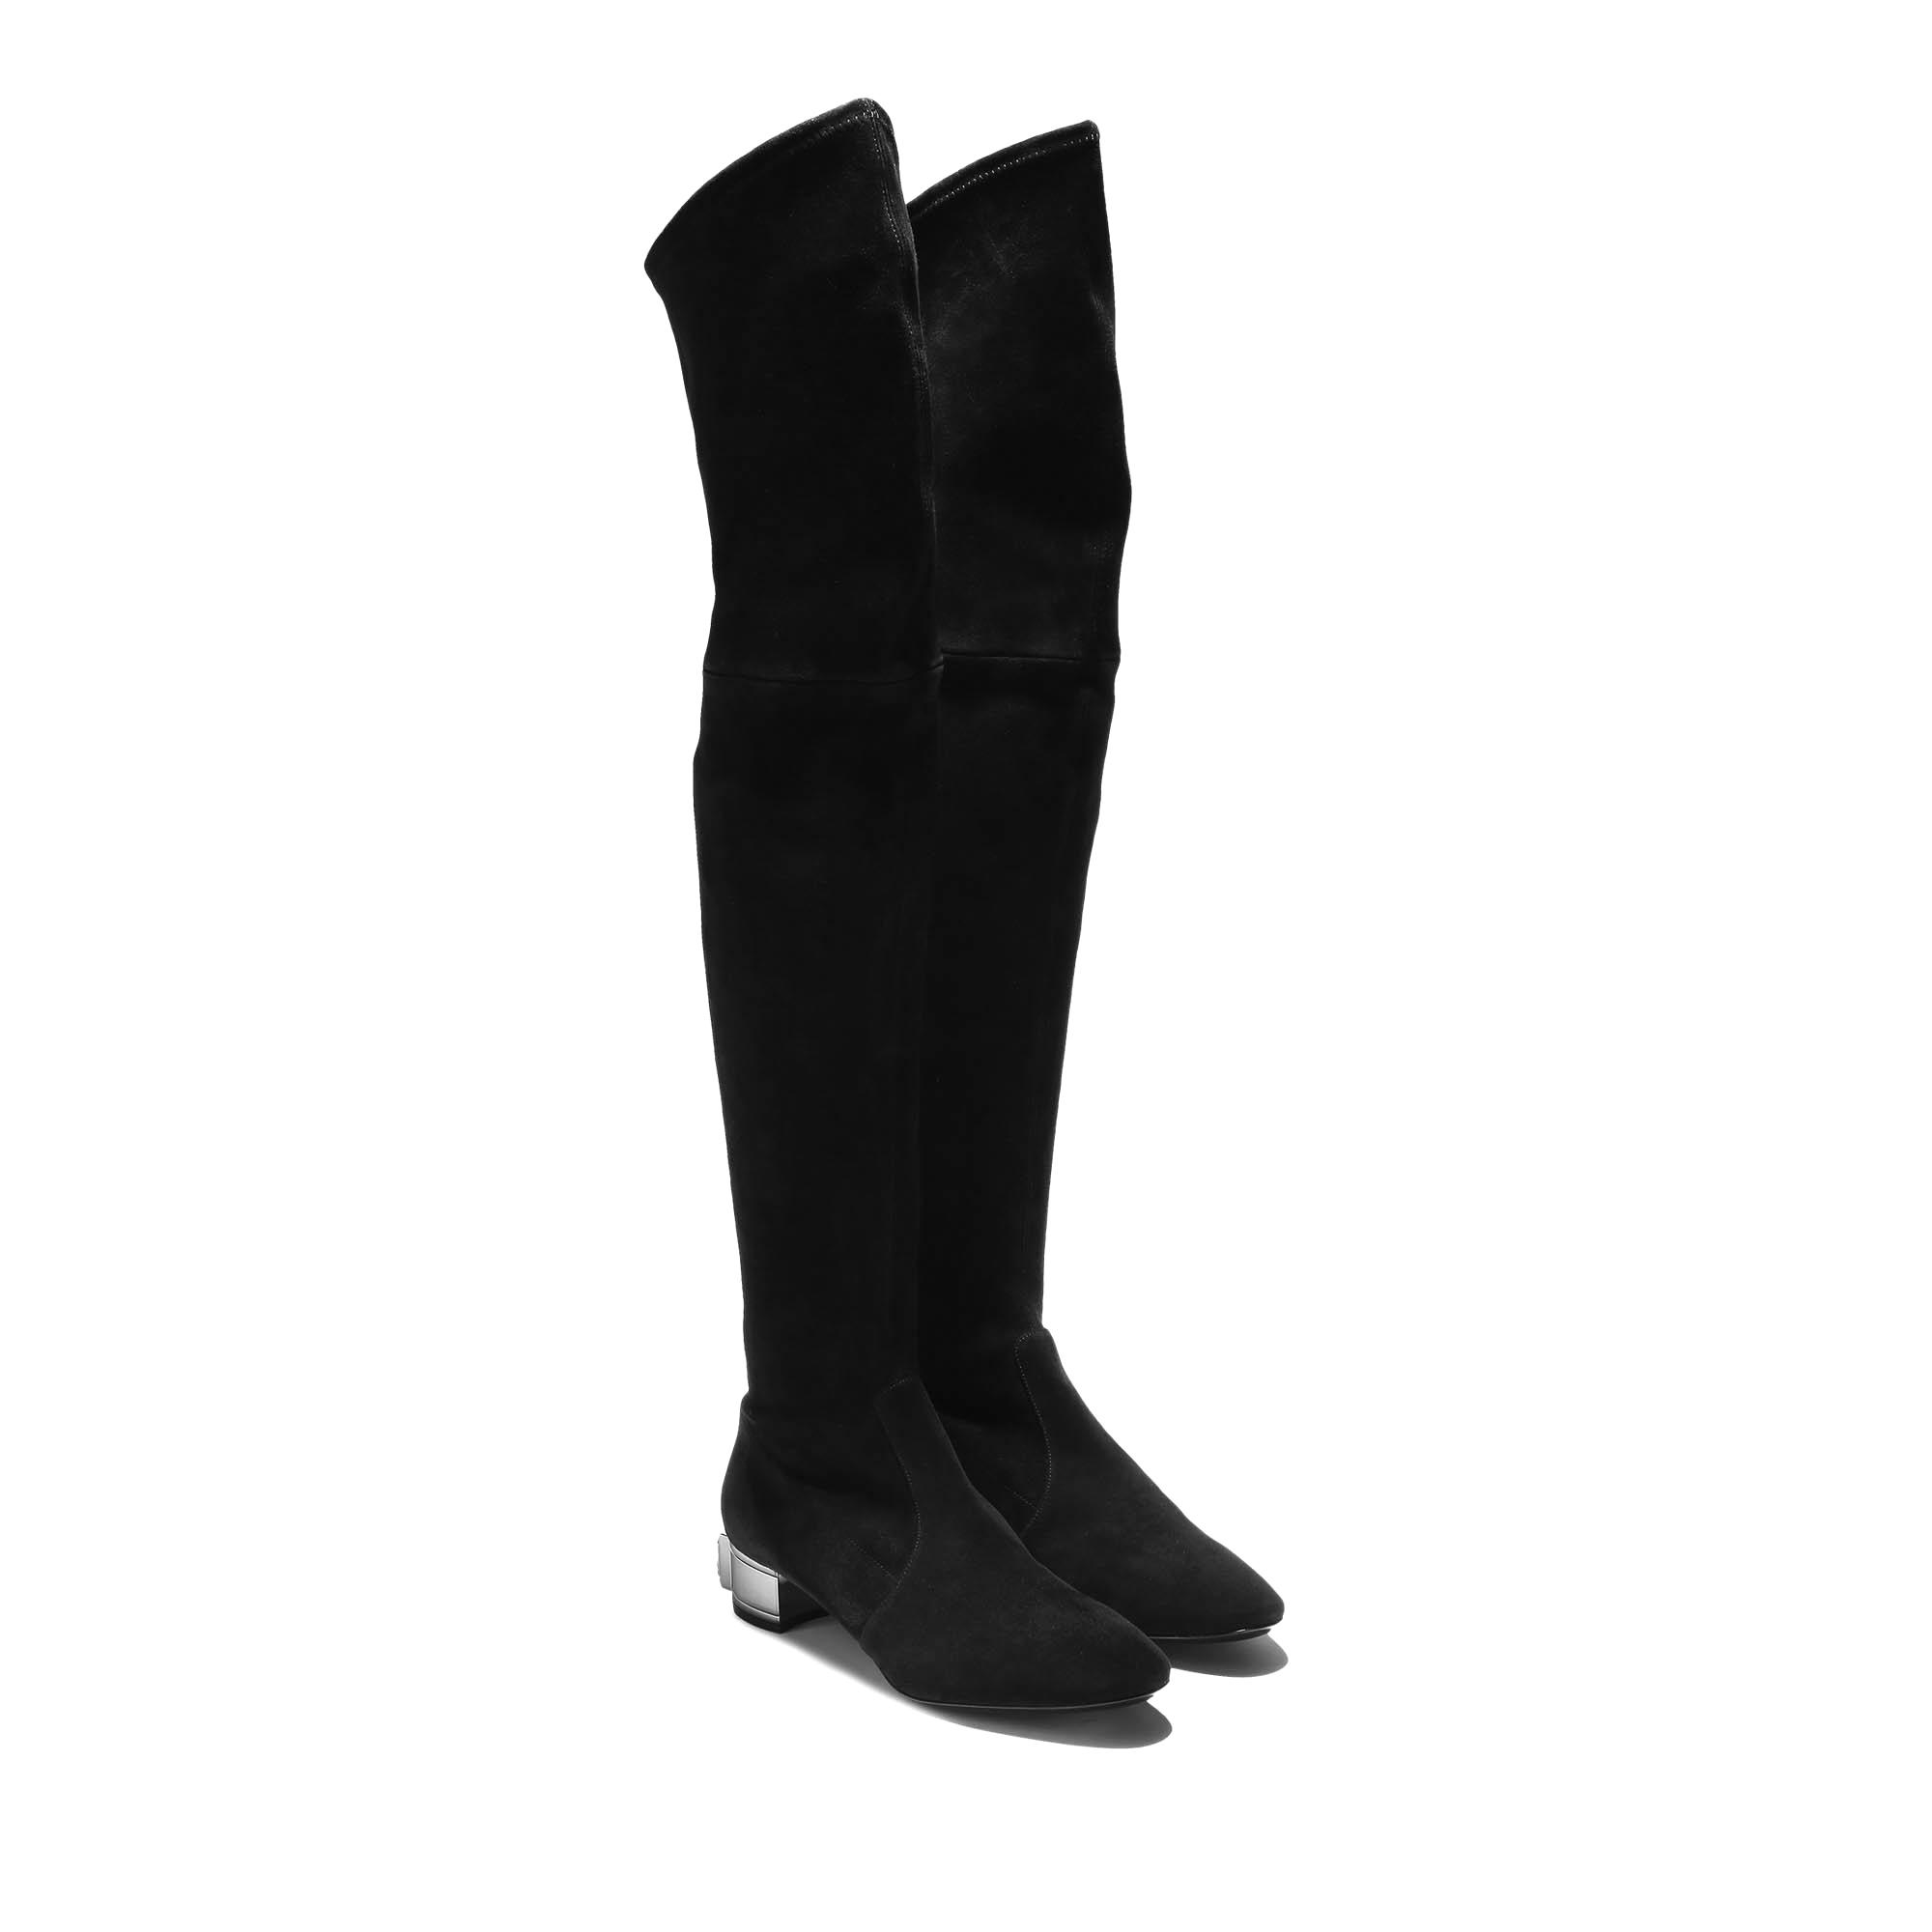 casadei soraya stretch suede thigh high boots in black lyst